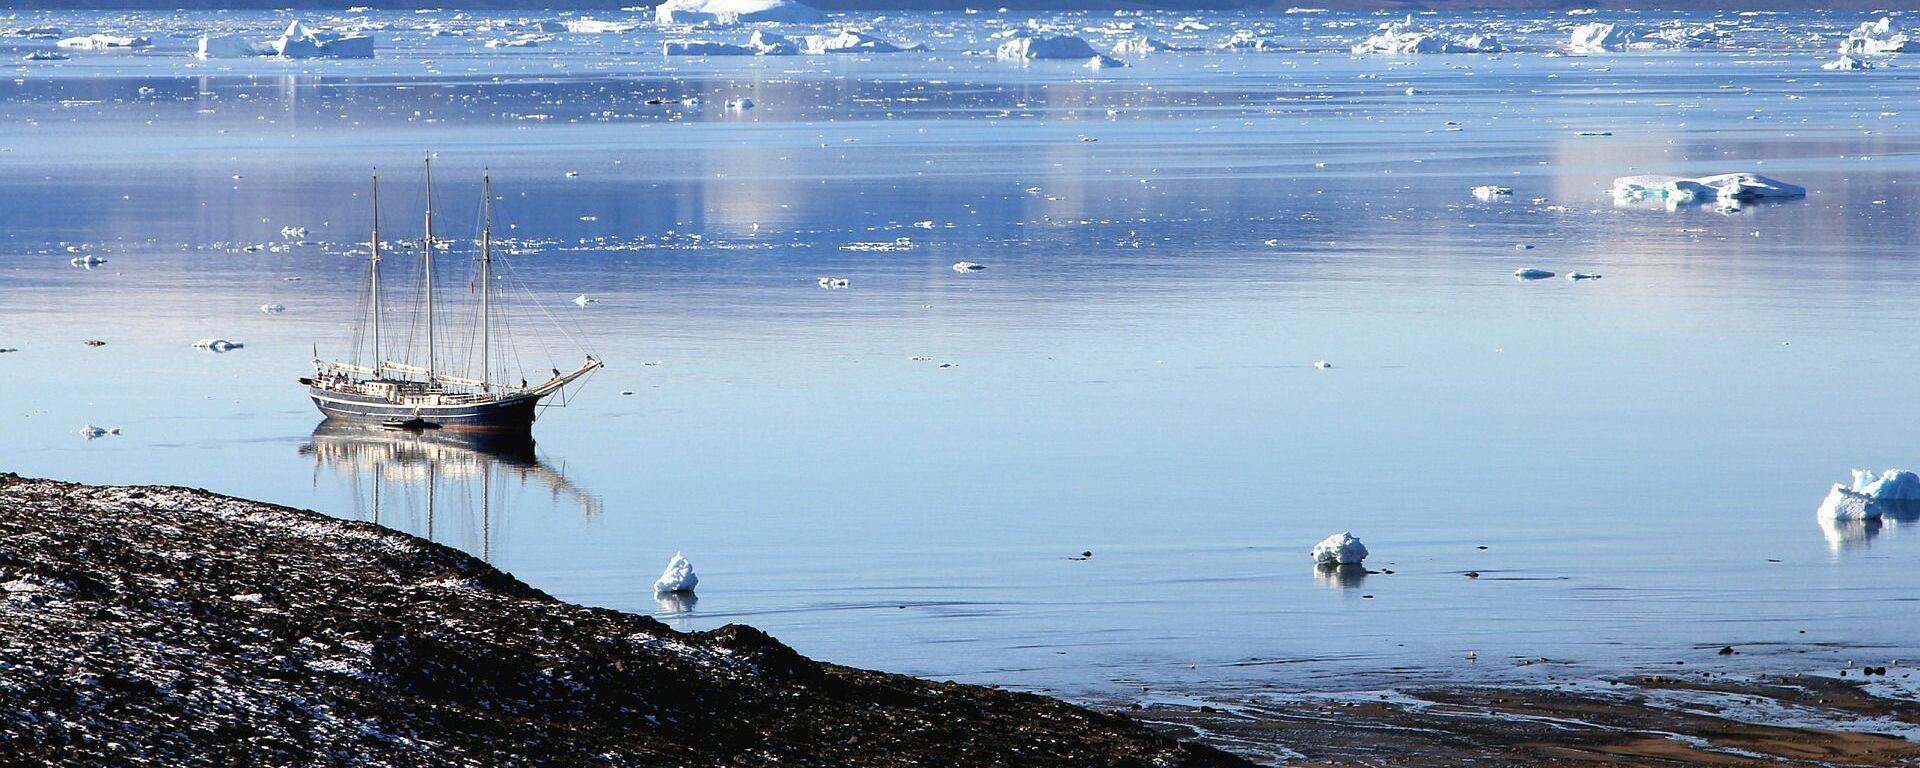 Lago en Groenlandia - Sputnik Mundo, 1920, 20.04.2021